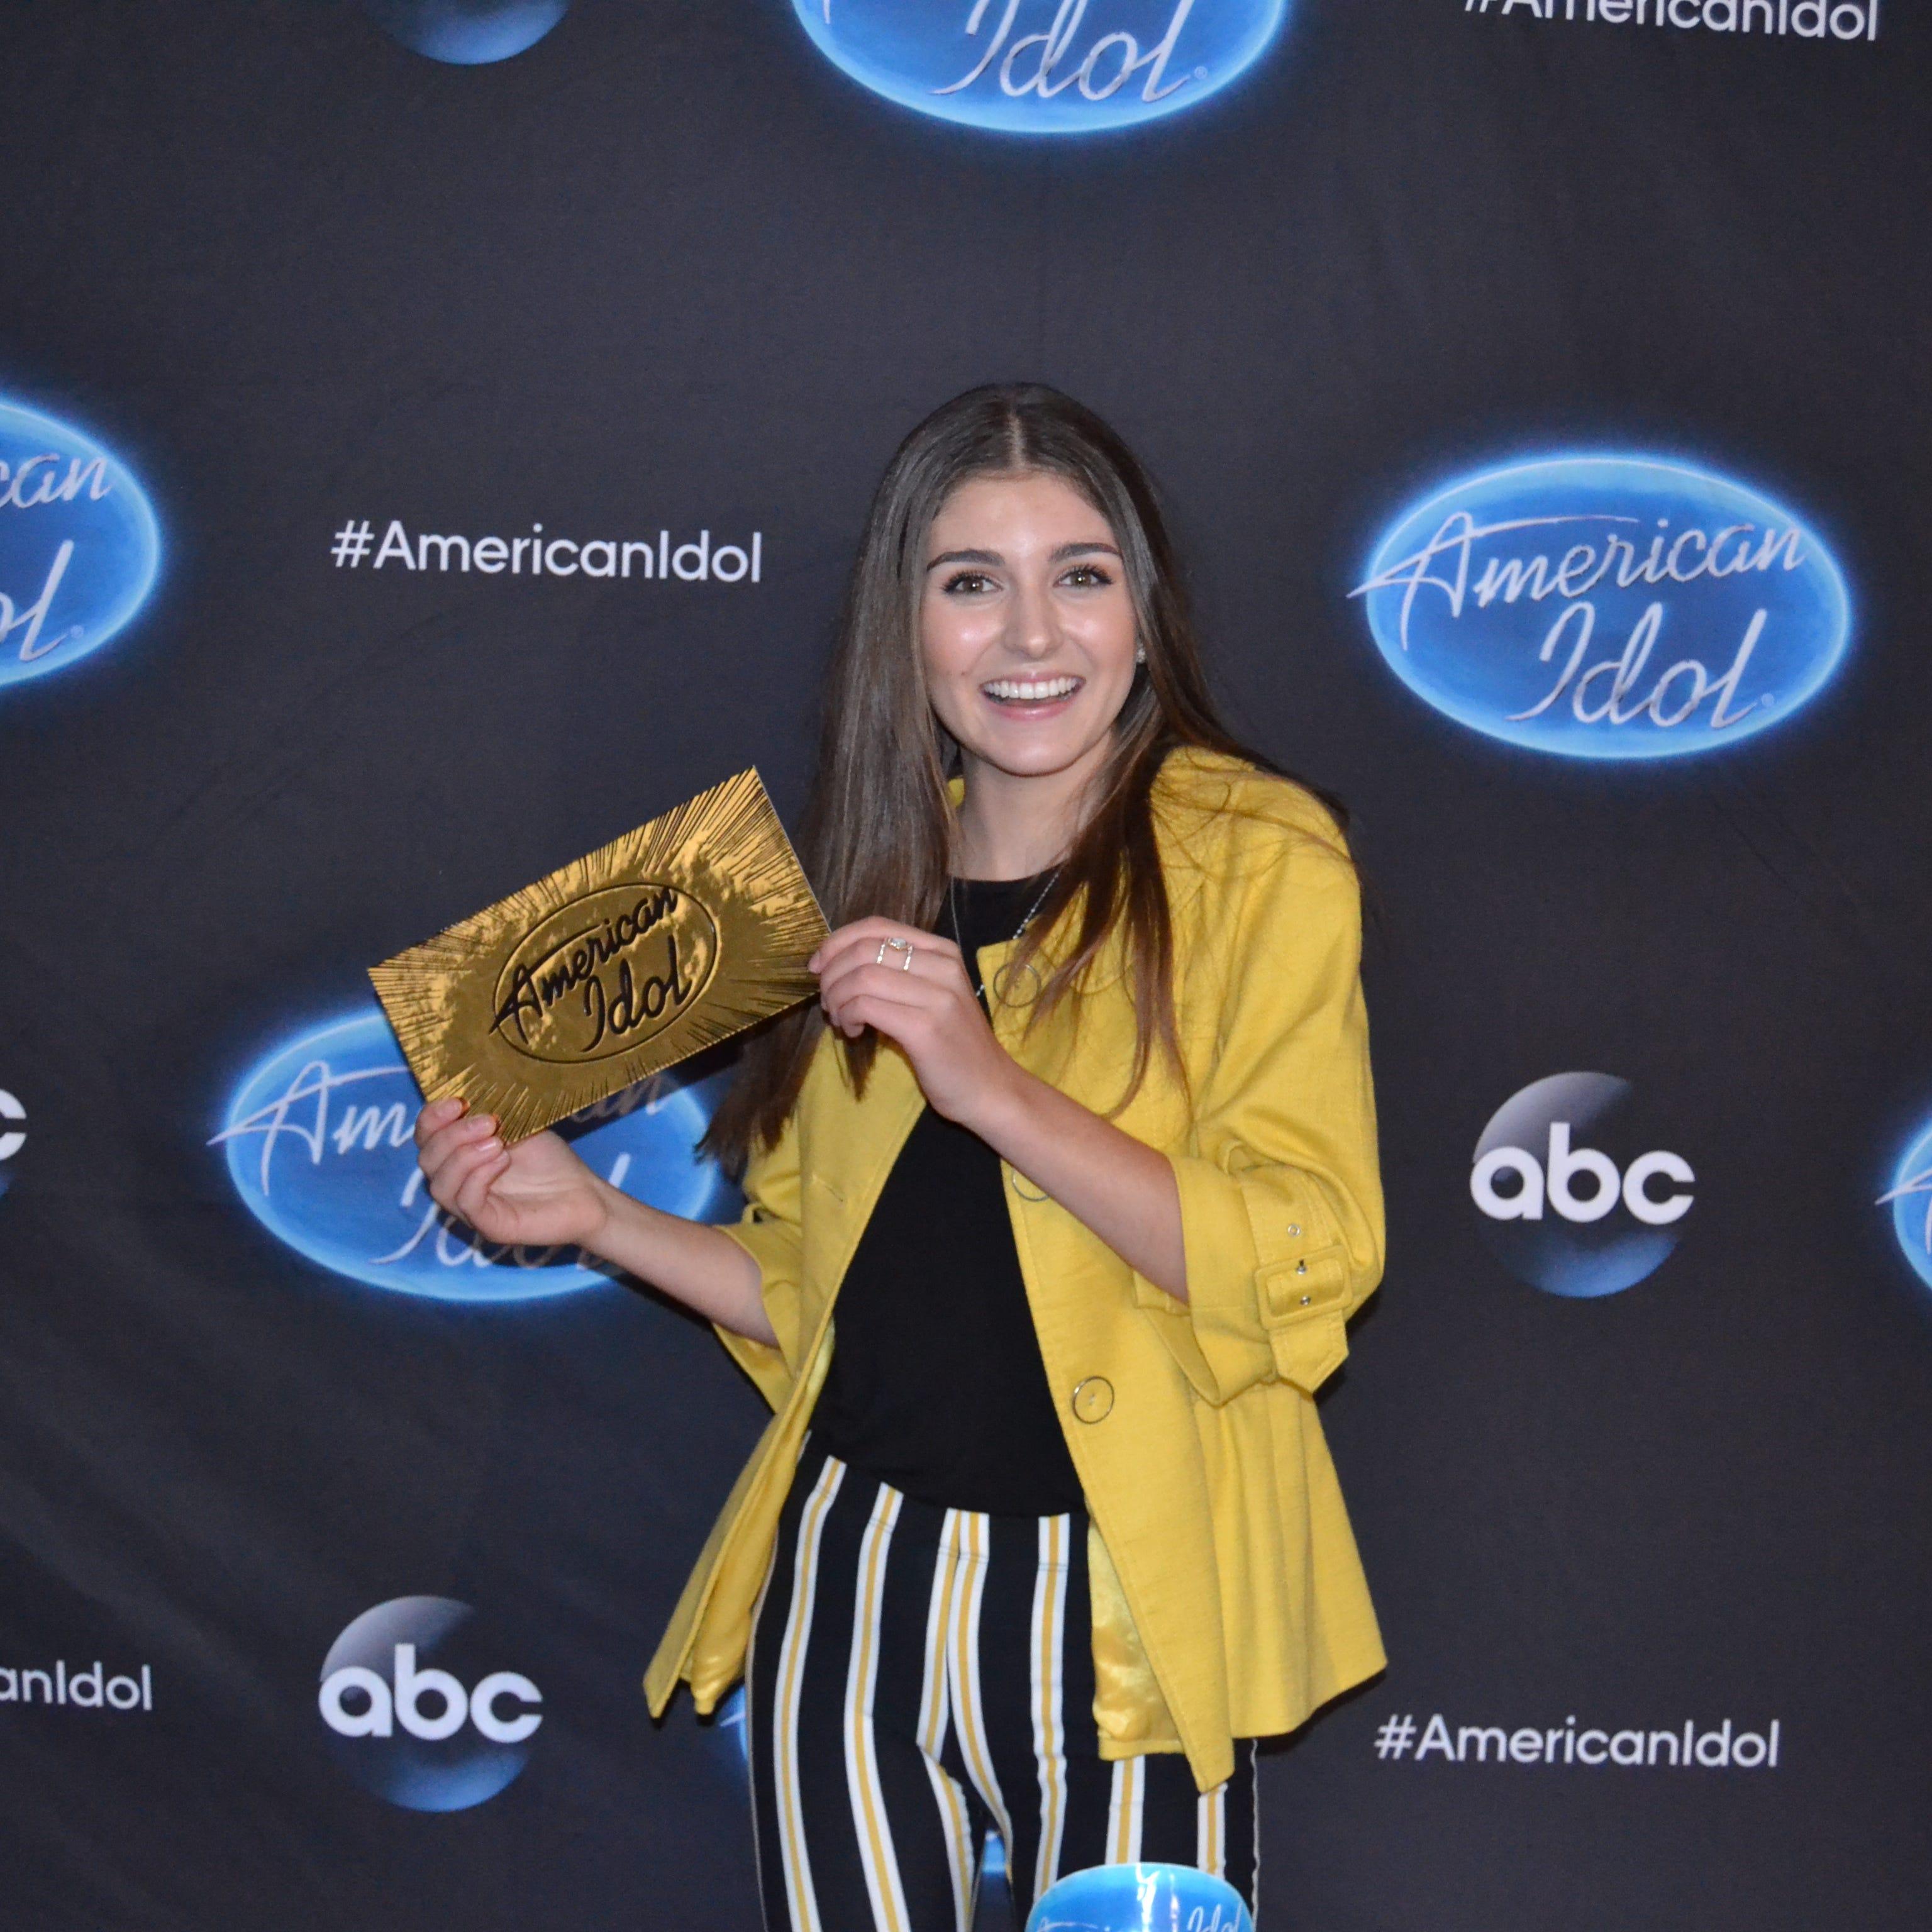 Oshkosh teen Franki Moscato gets golden ticket on 'American Idol,' advances to Hollywood